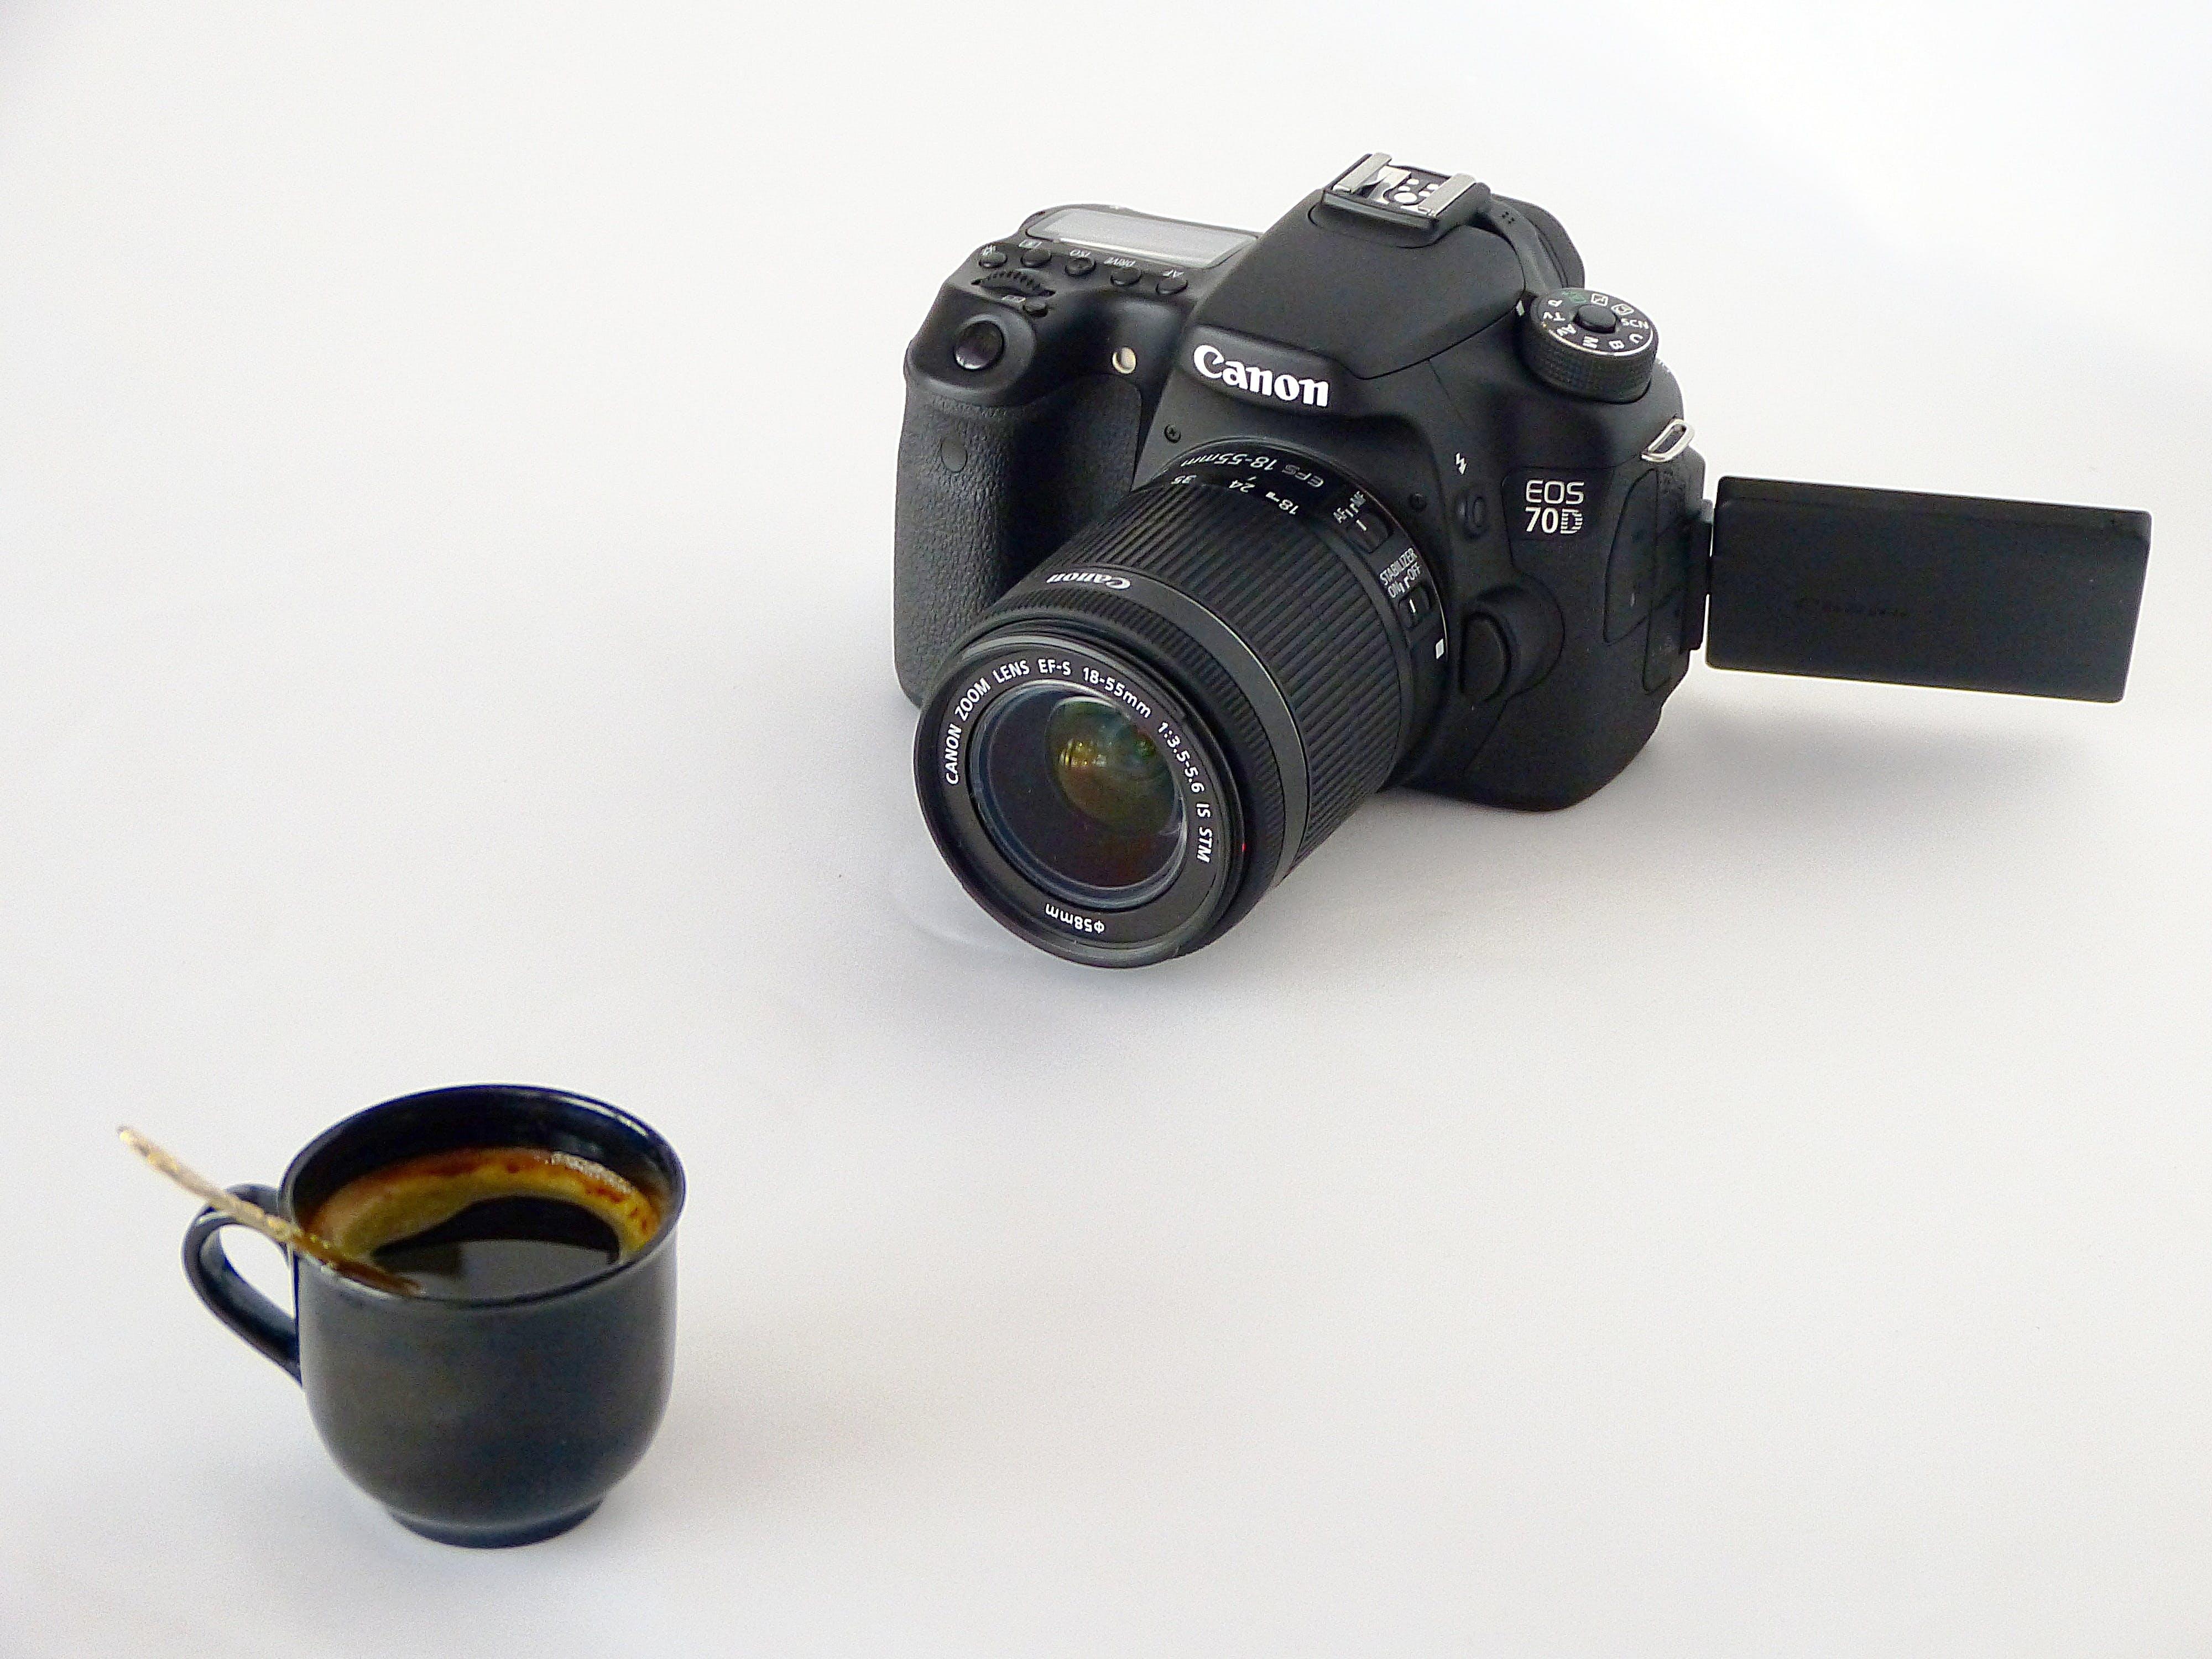 Black Canon Dslr Camera in Front of Coffee in Black Ceramic Teacup